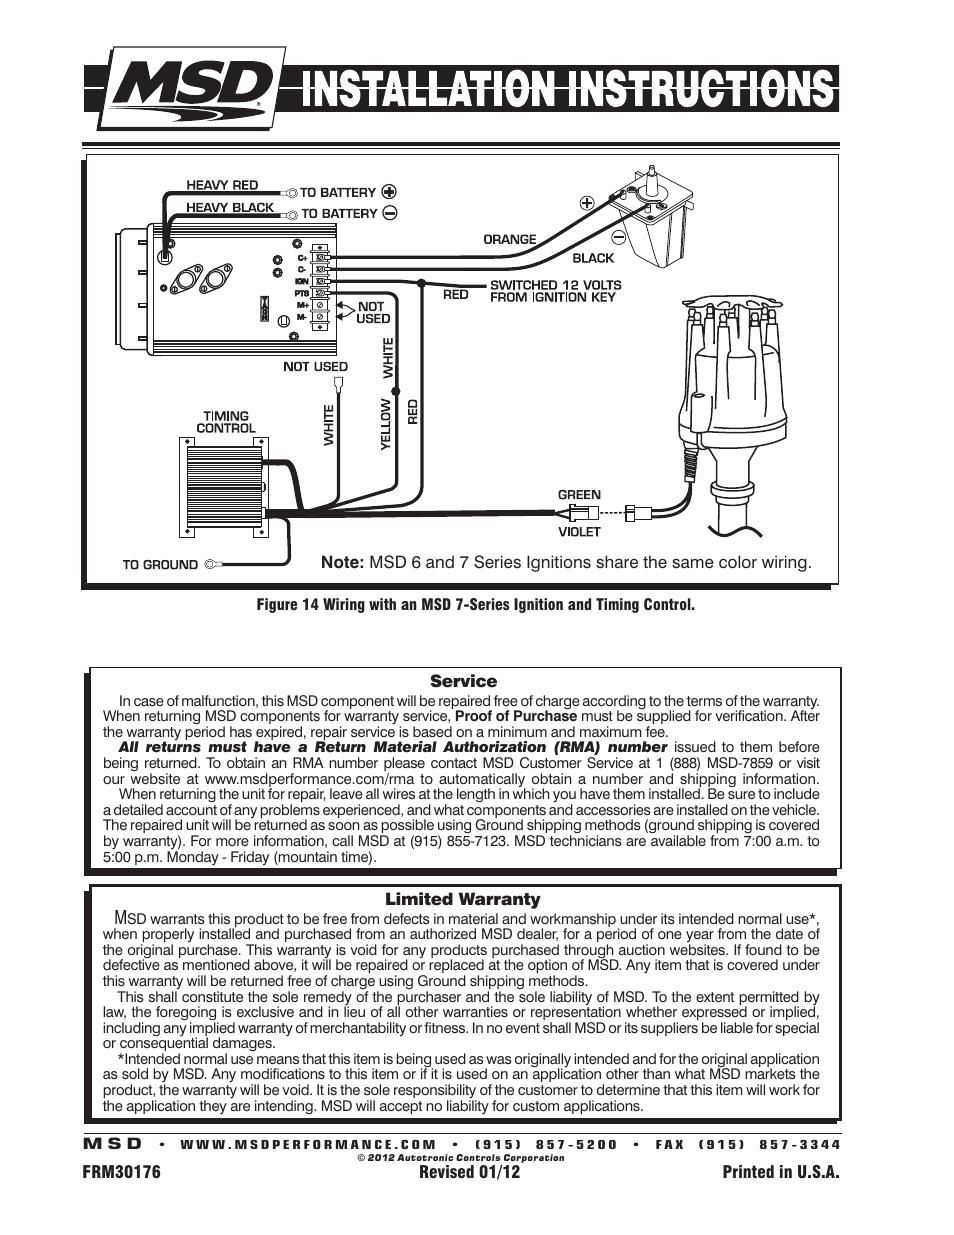 medium resolution of msd 8363 cadillac v8 distributor w vacuum advance installation user manual page 8 8